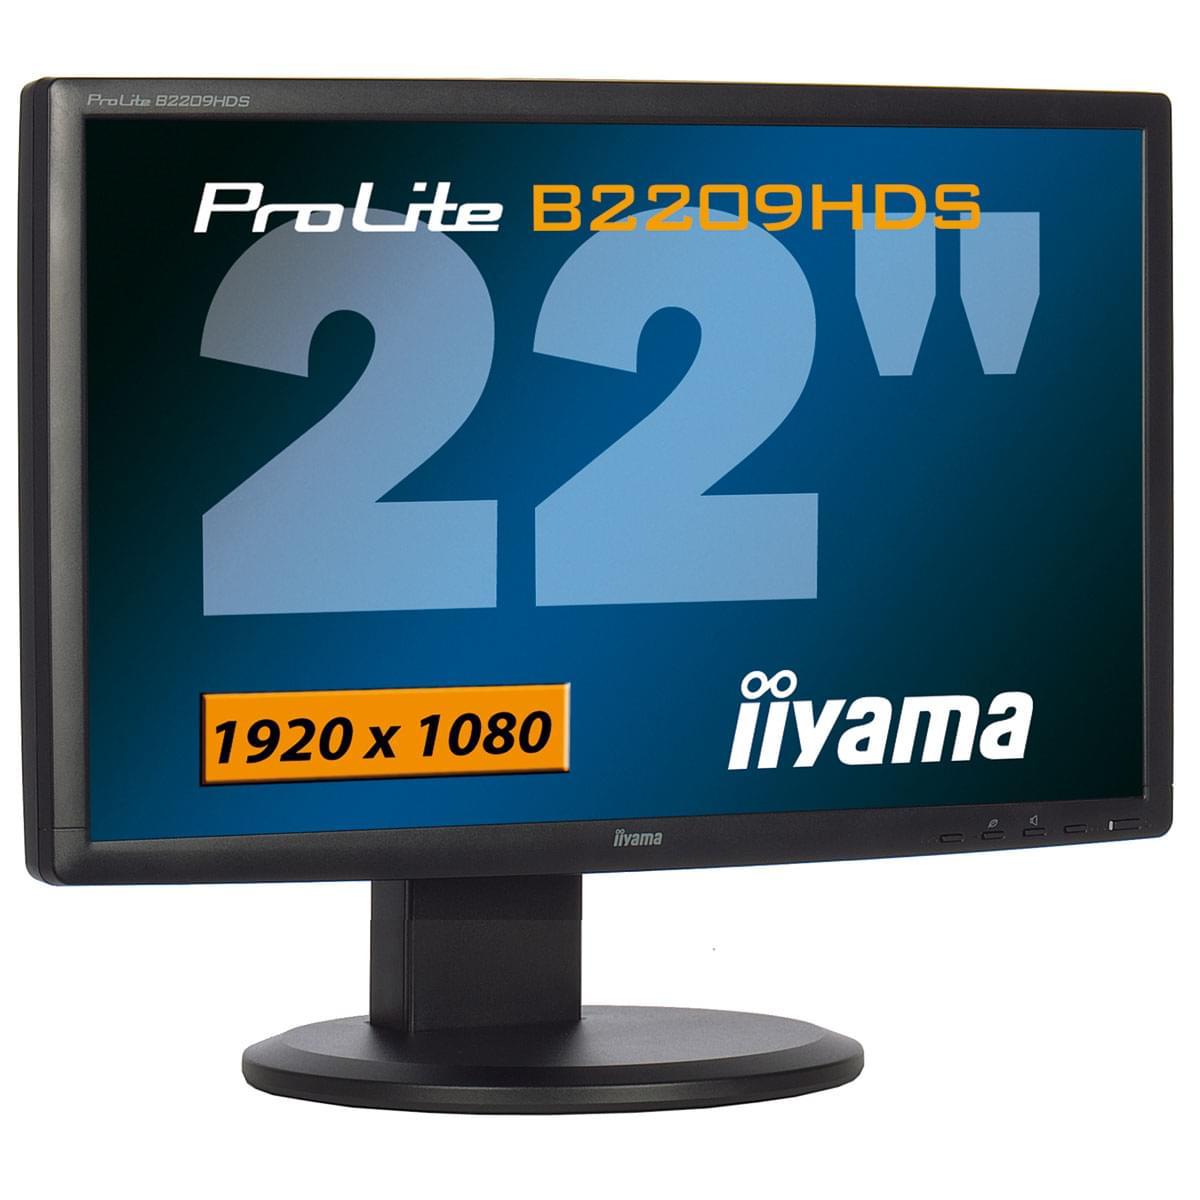 Iiyama PLB2209HDS-B1 (PLB2209HDS-B1 obso) - Achat / Vente Ecran PC sur Cybertek.fr - 0